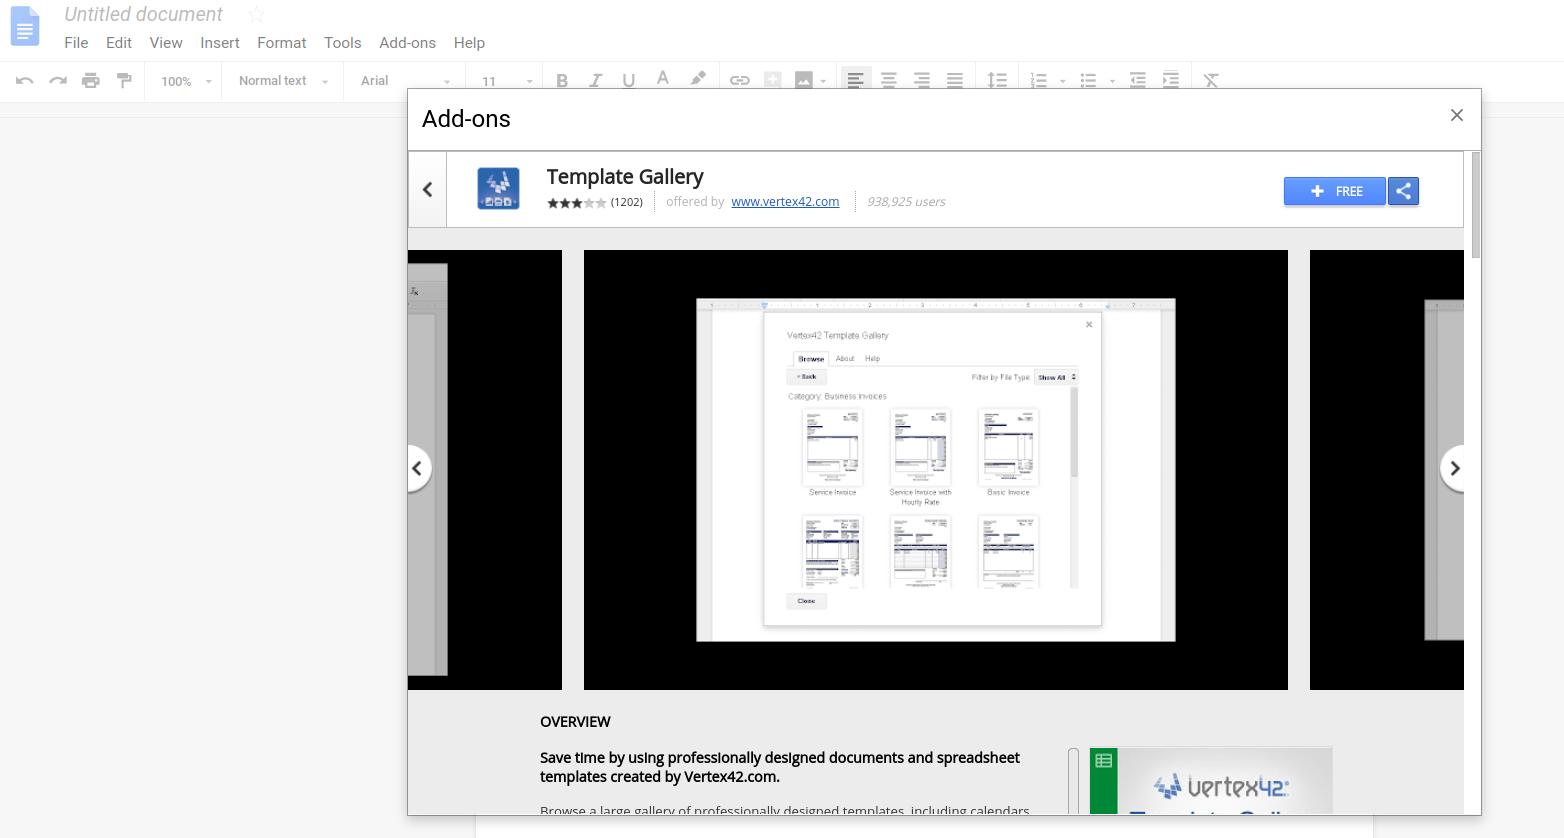 Google Docs Template Gallery | DeviceDaily.com